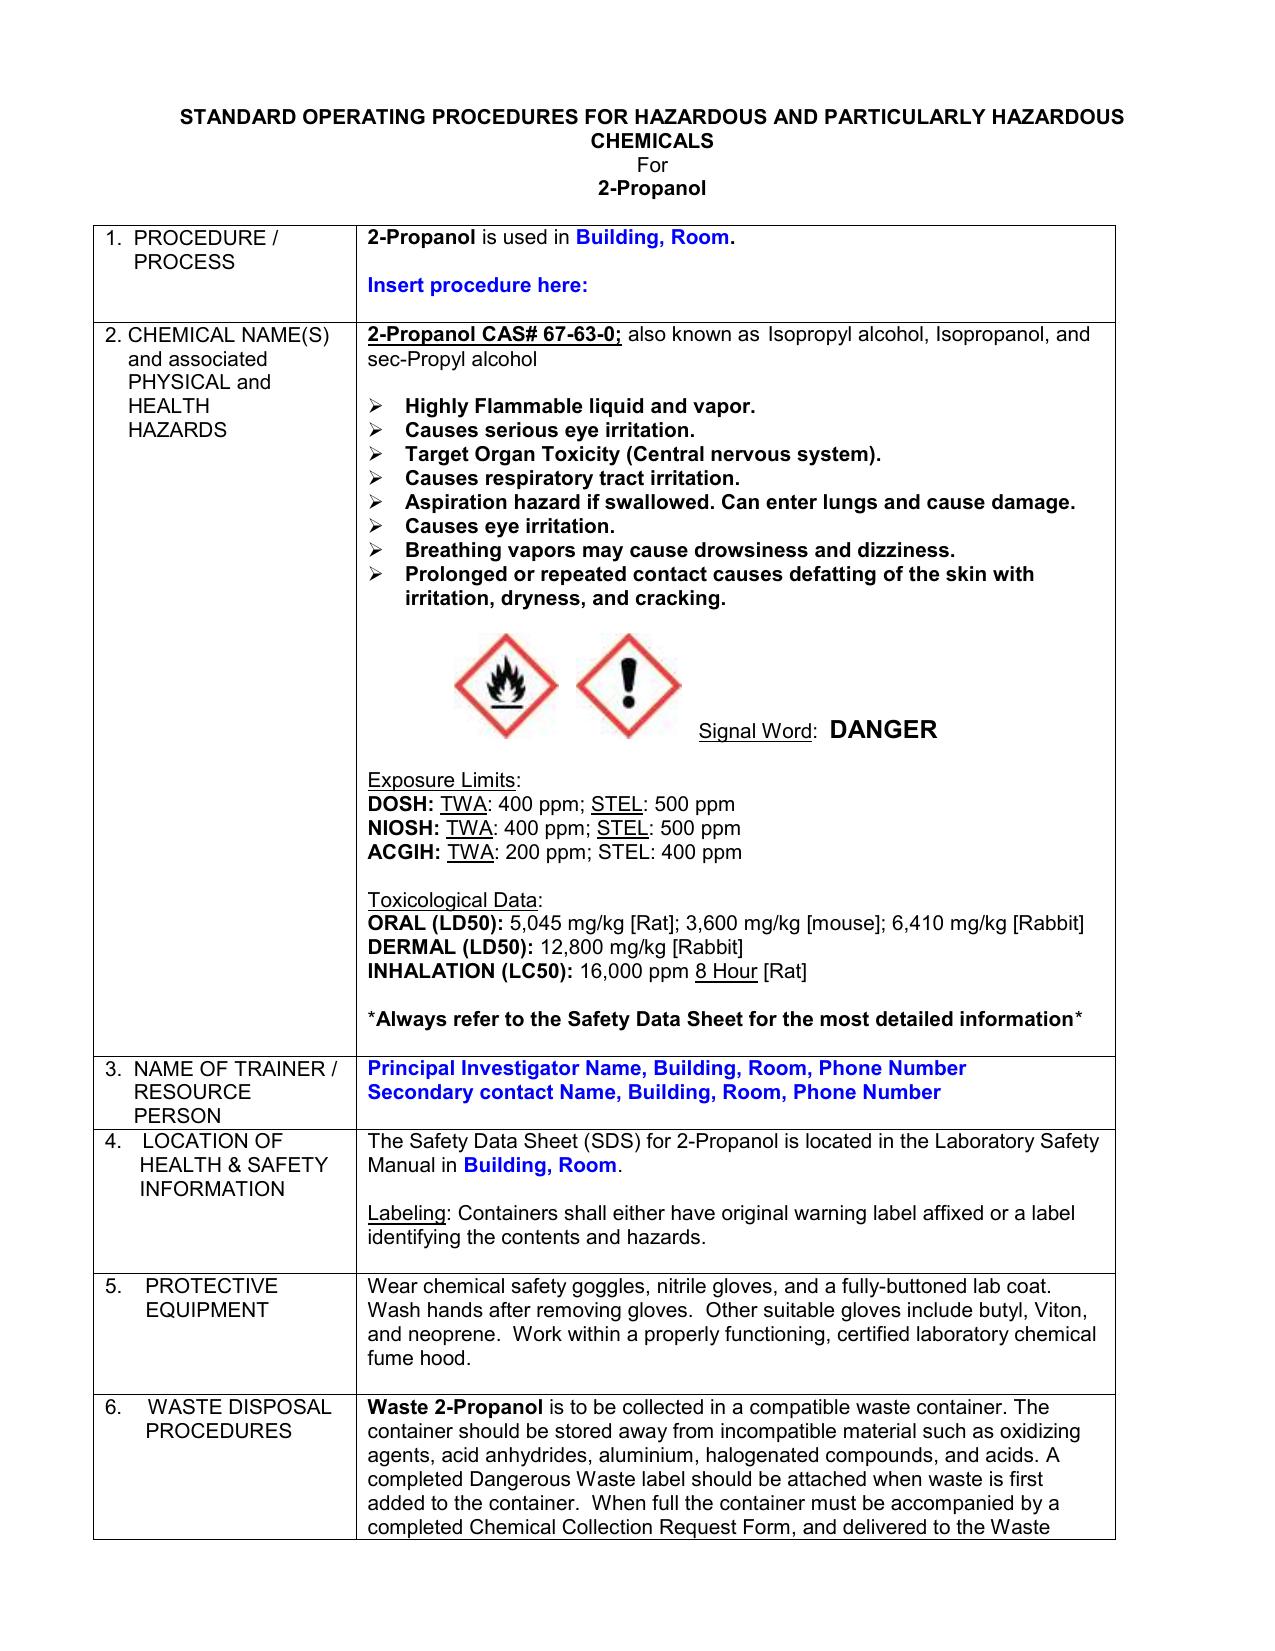 2-Propanol - WSU Environmental Health & Safety